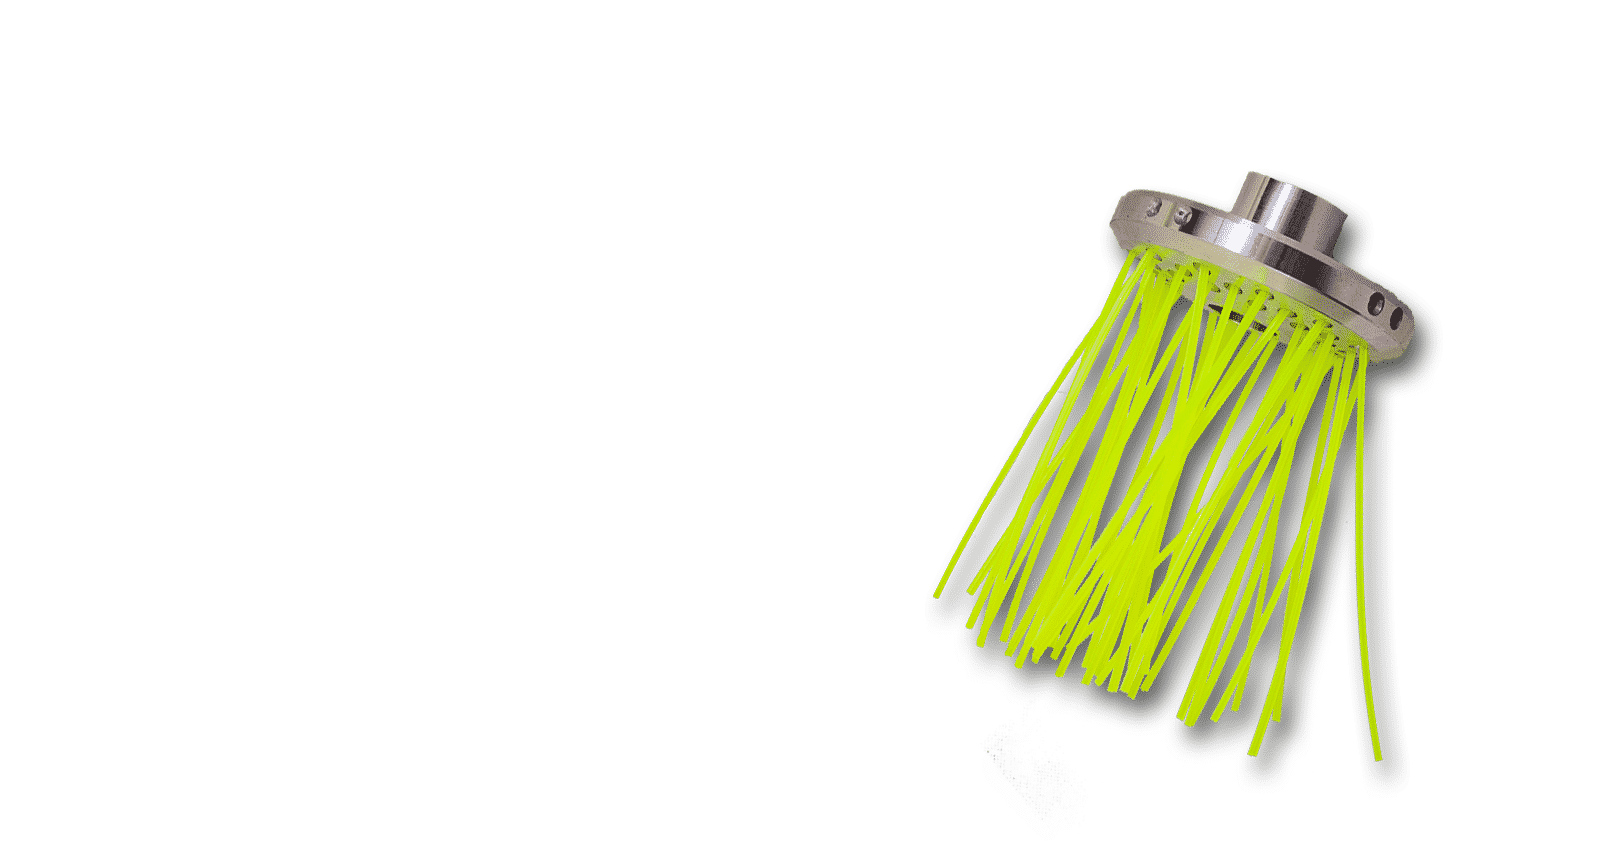 Best Neuheiten - Bürstenkopf, Bürstenköpfe